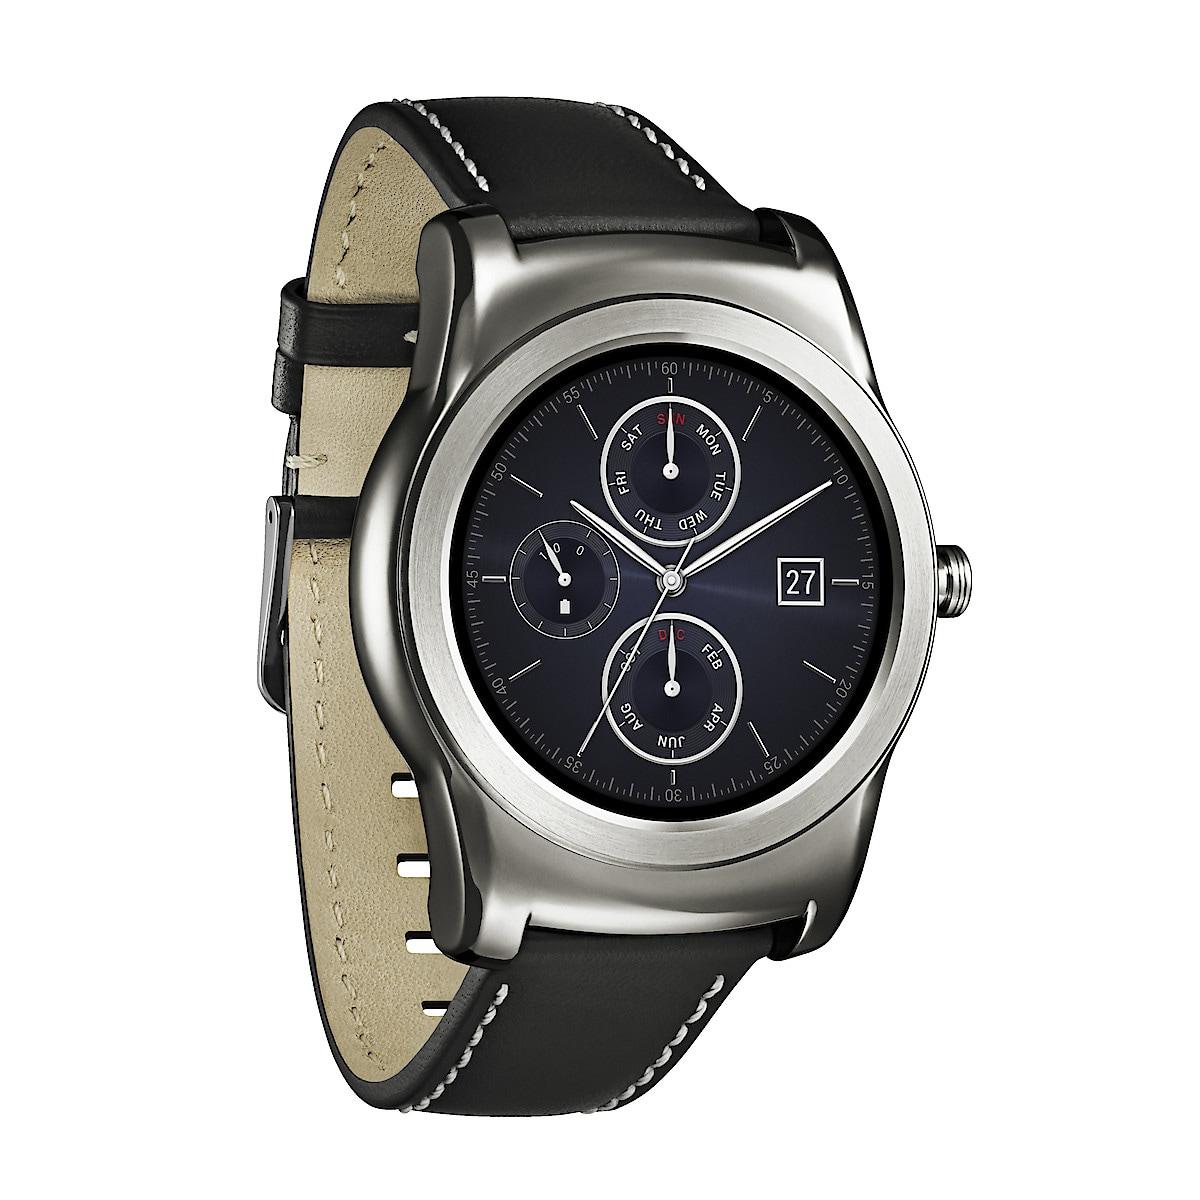 Älykello LG G Watch Urbane